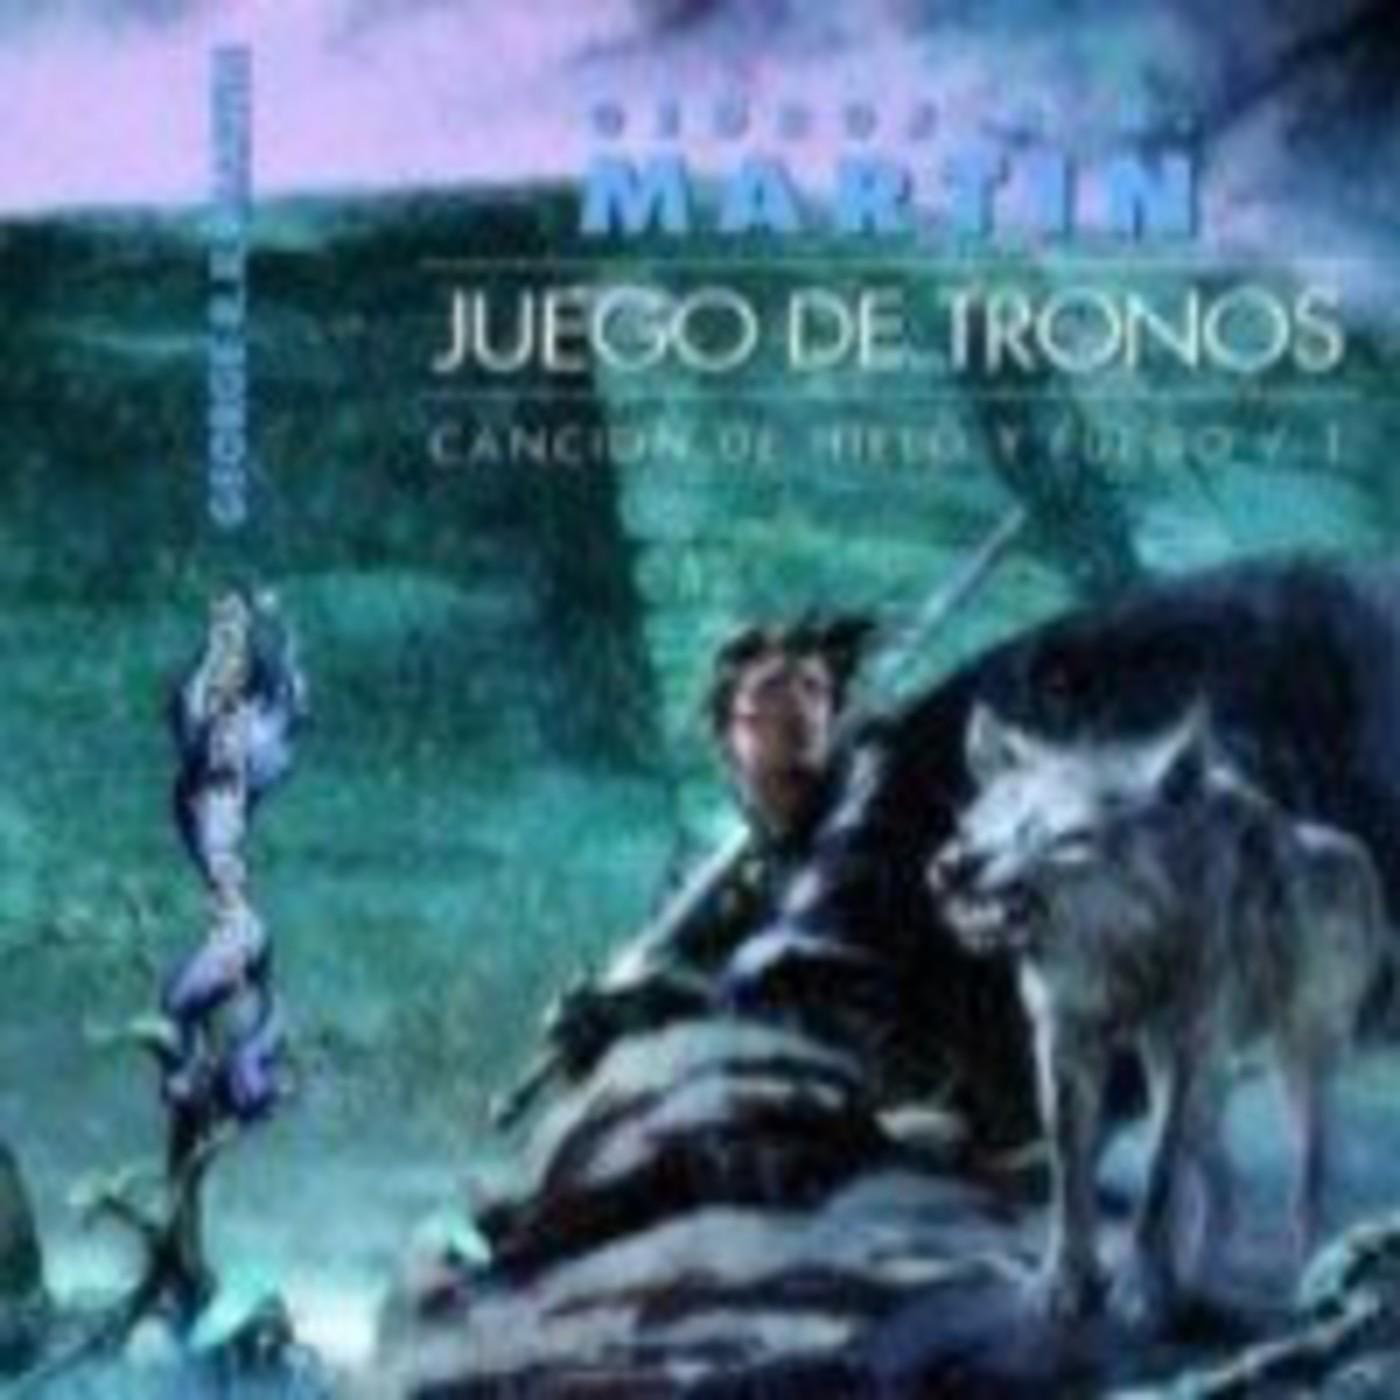 Escucha Audiolibro Juego de tronos (Voz Humana) HQ - iVoox